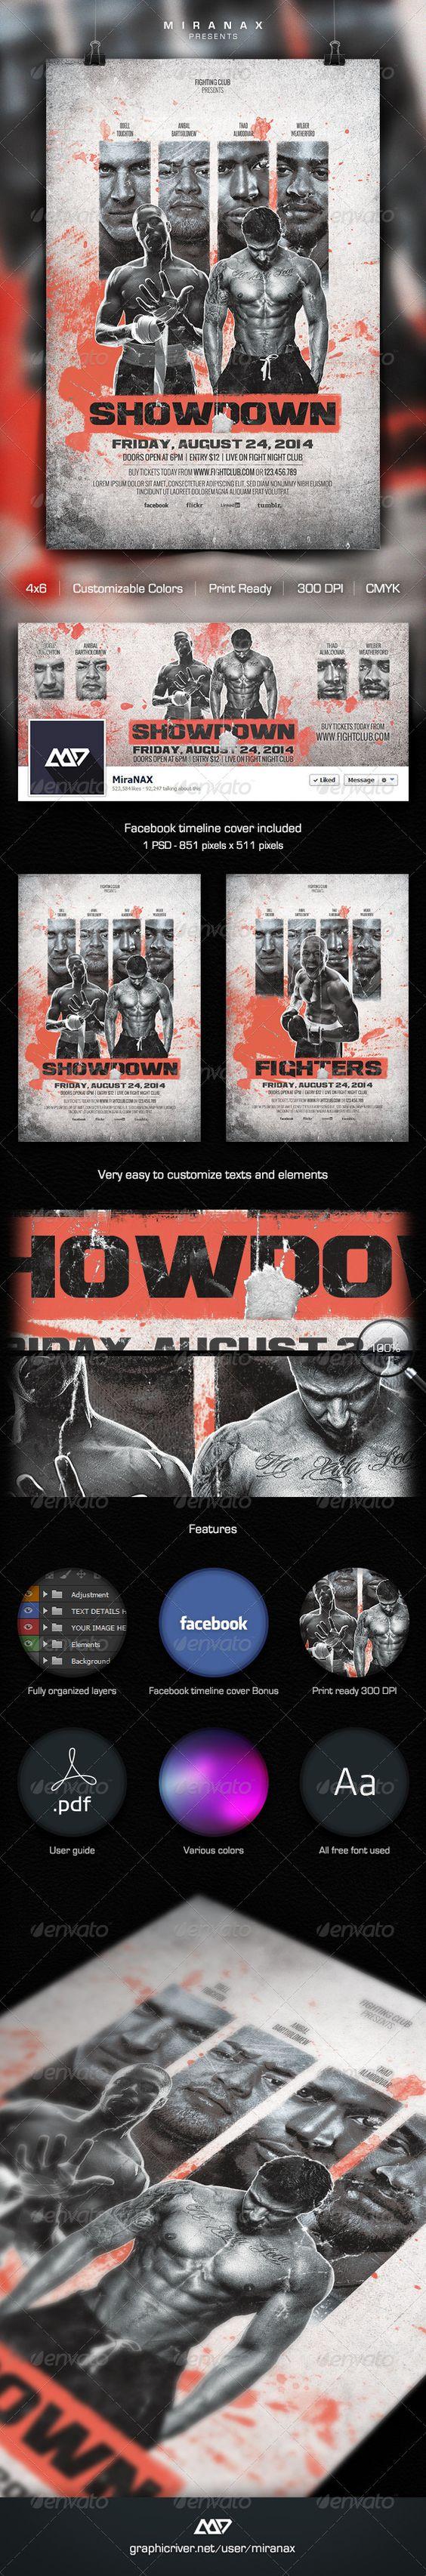 Showdown Fighting Club Flyer Template – Showdown Flyer Template